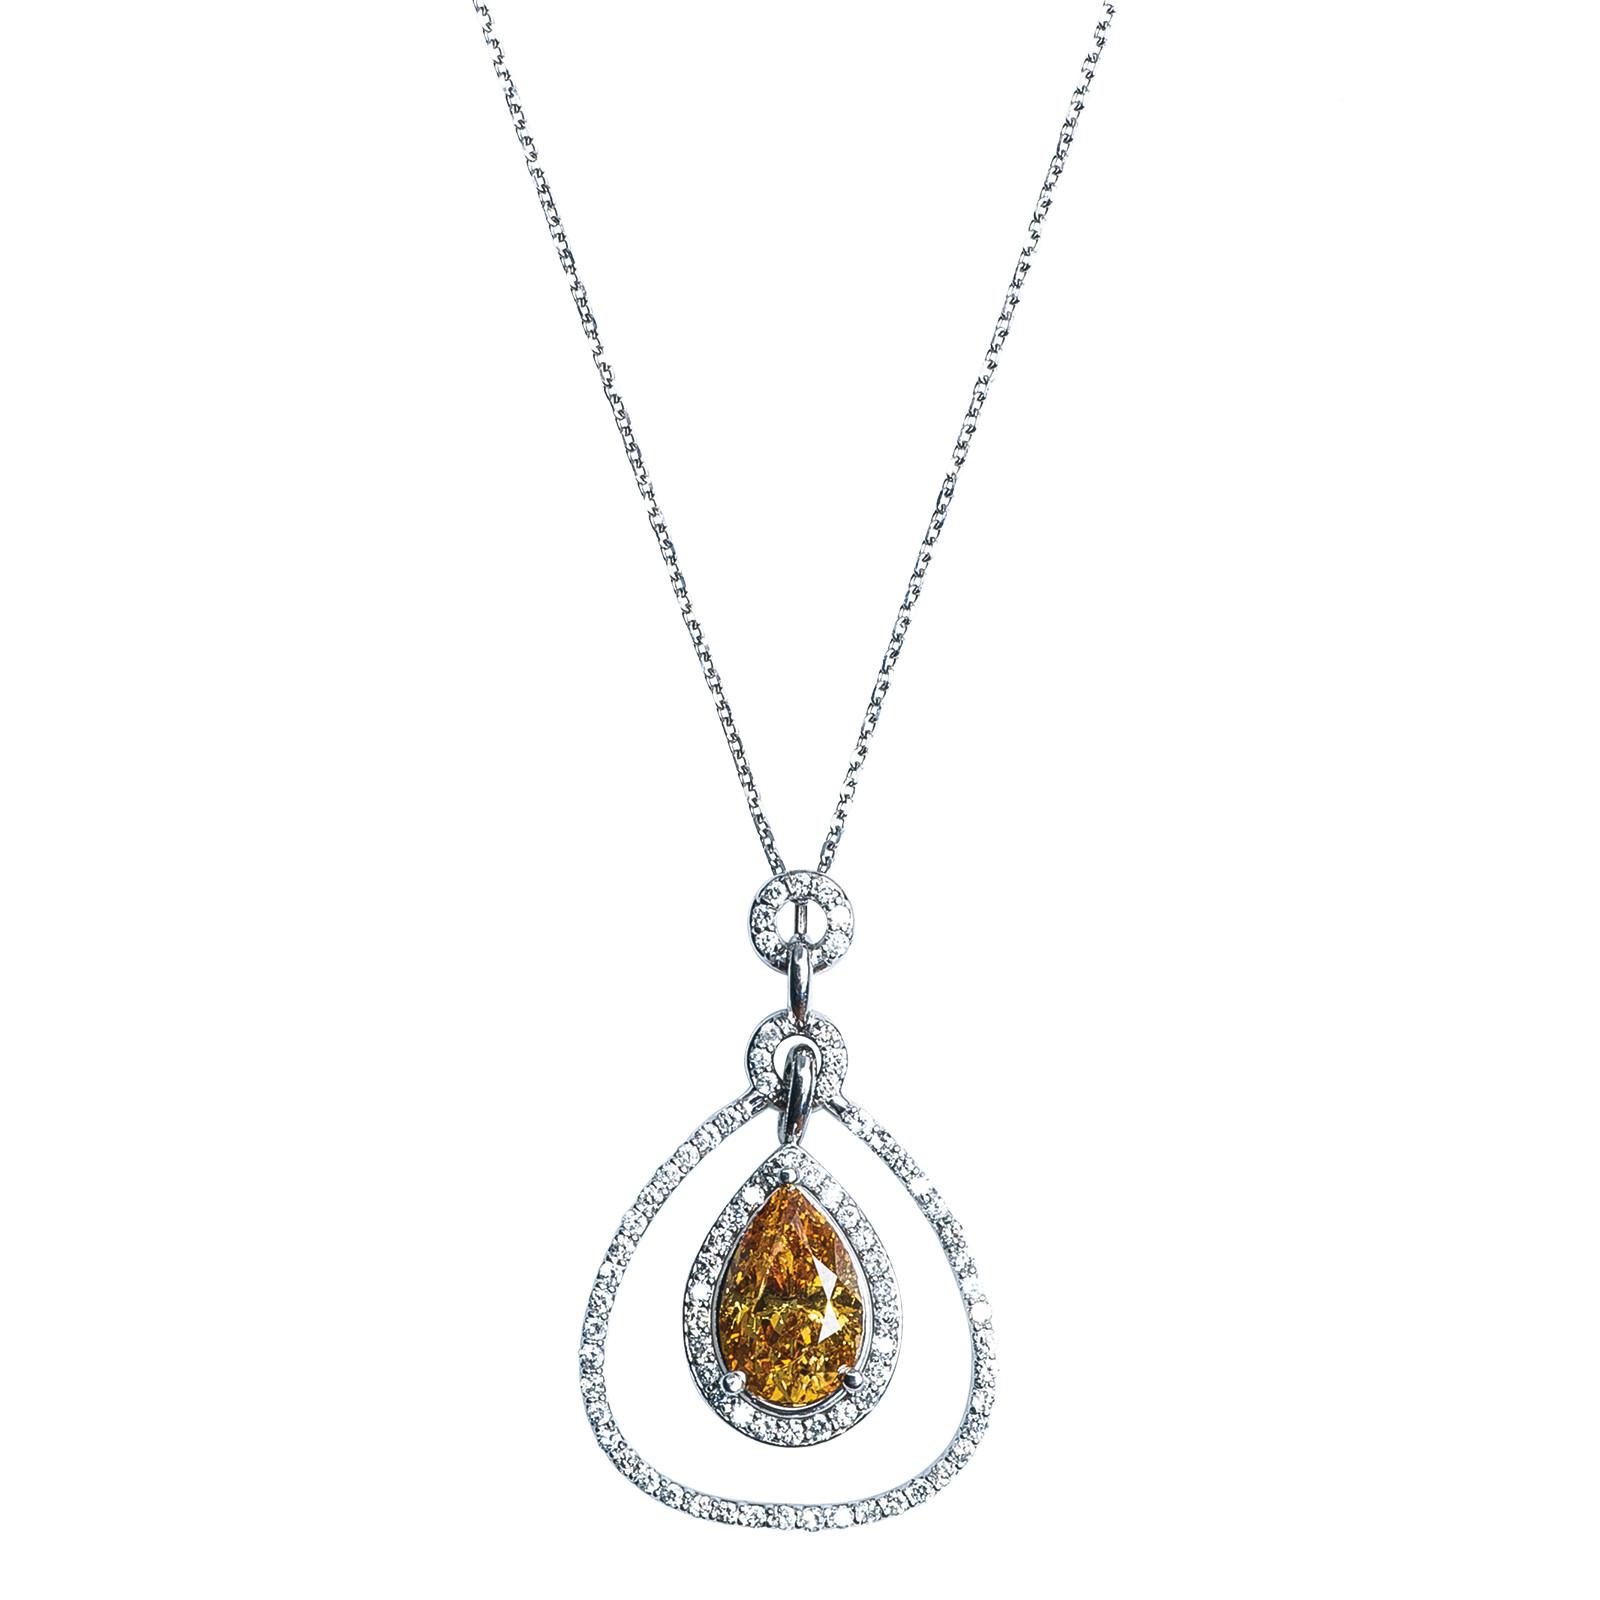 Vintage 3.10 CTW Fancy Deep Yellow-Orange & White Diamond Necklace